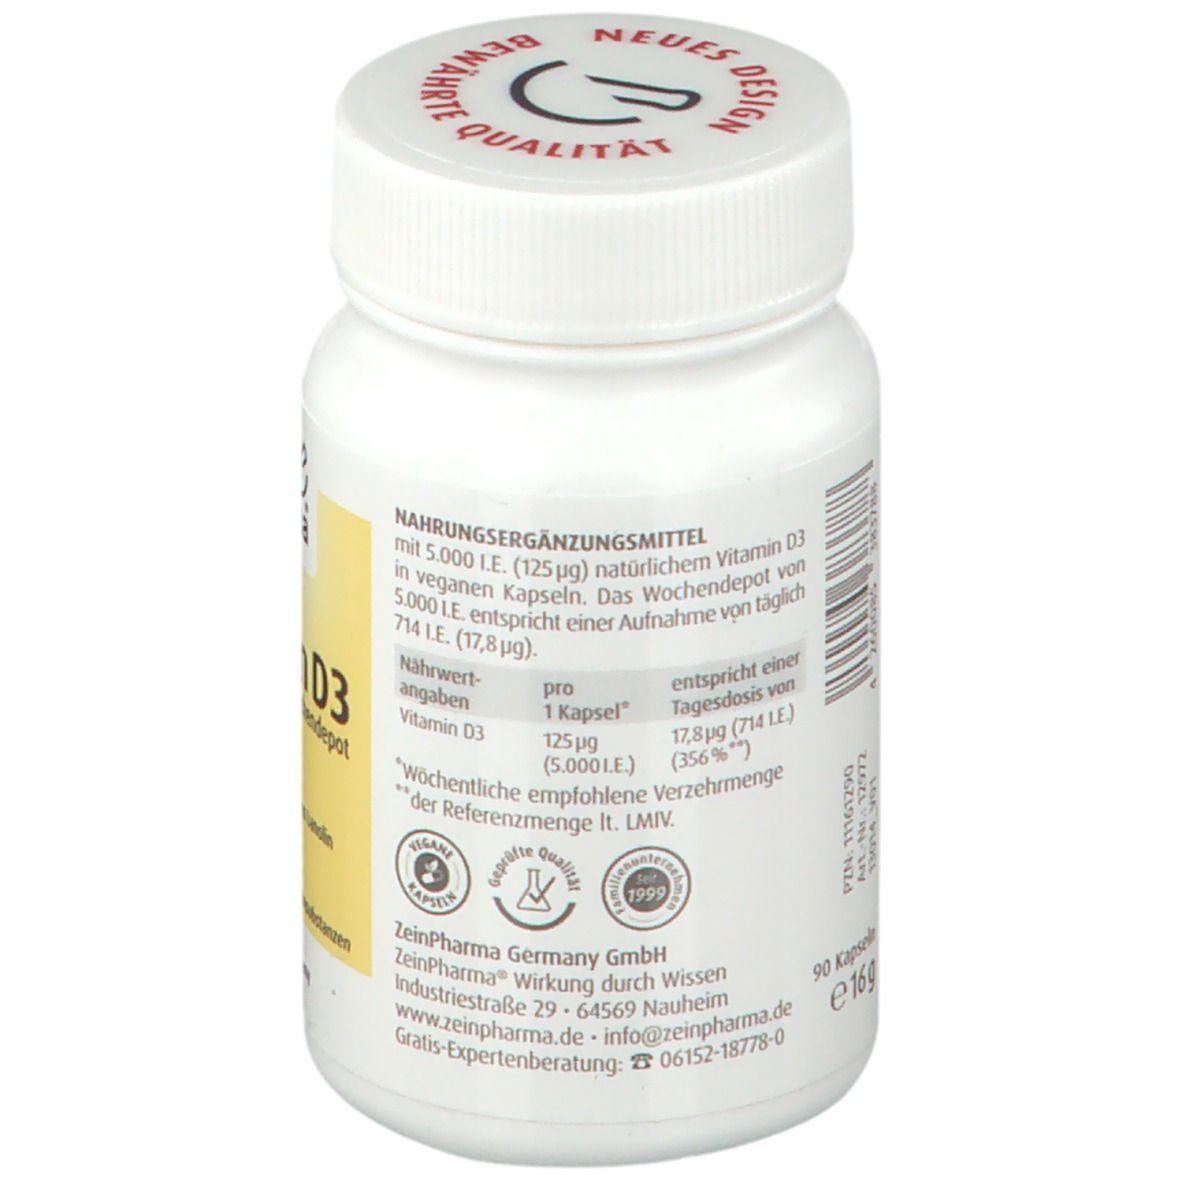 aus natürlichem Lanolin, Vitamin D3 Depot 250 Softgel-Kapseln á 5000 I.E